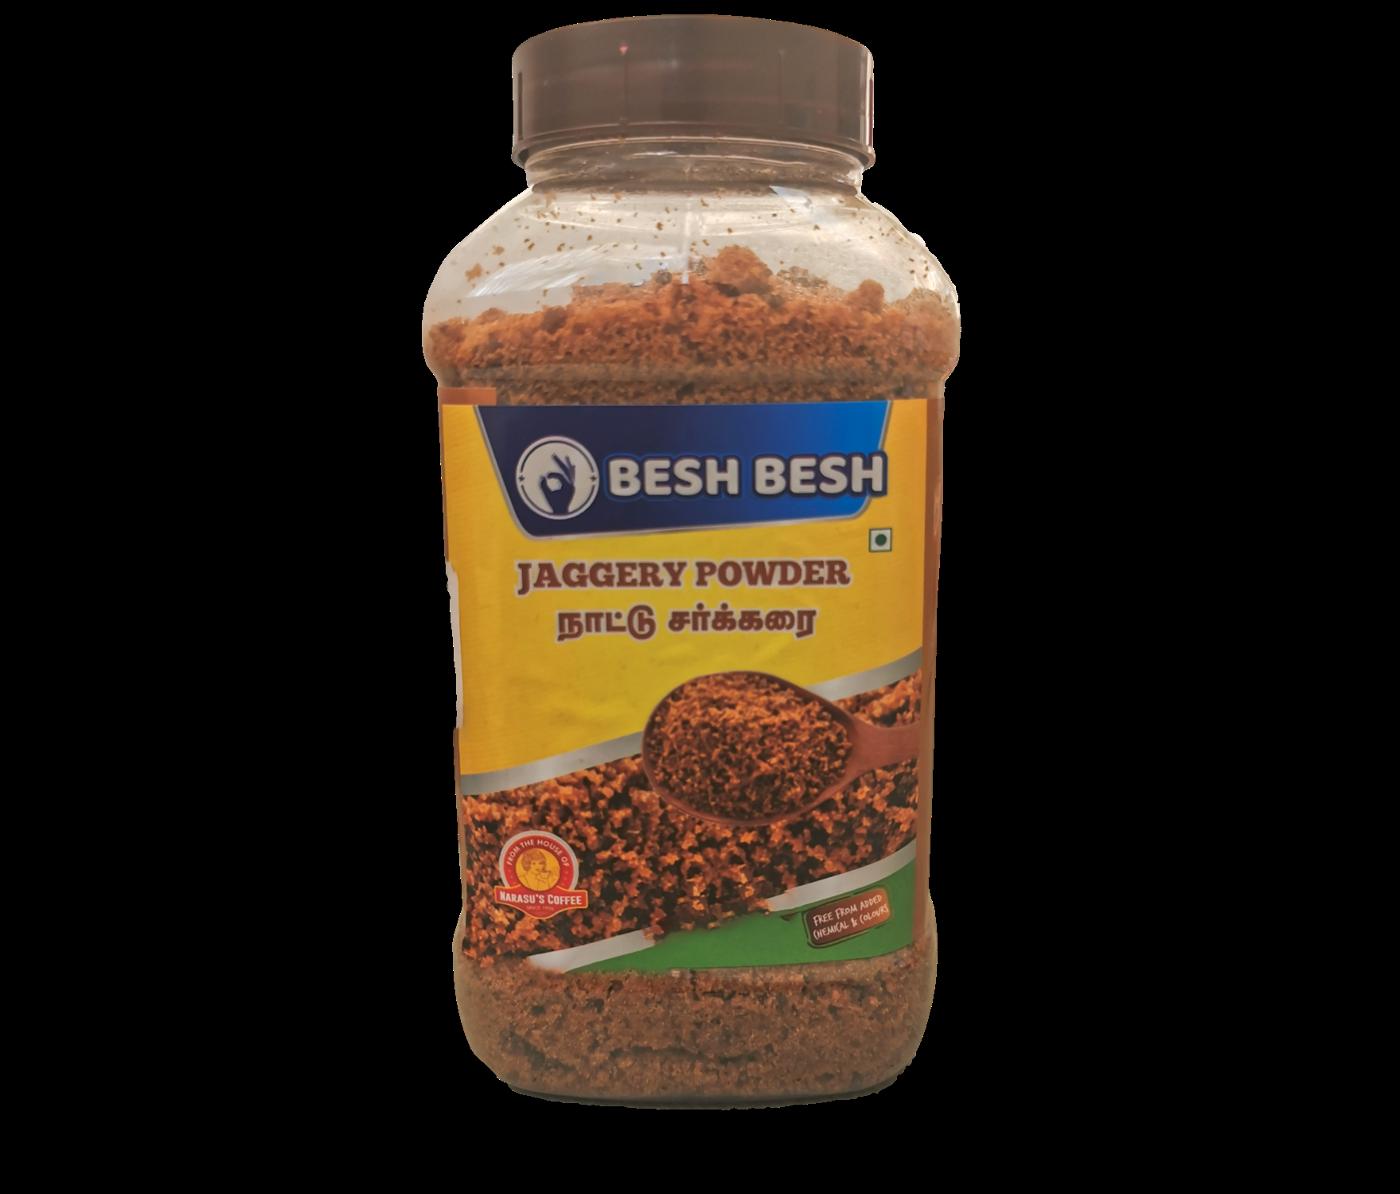 Besh Besh Jaggery Powder (Cane Sugar)